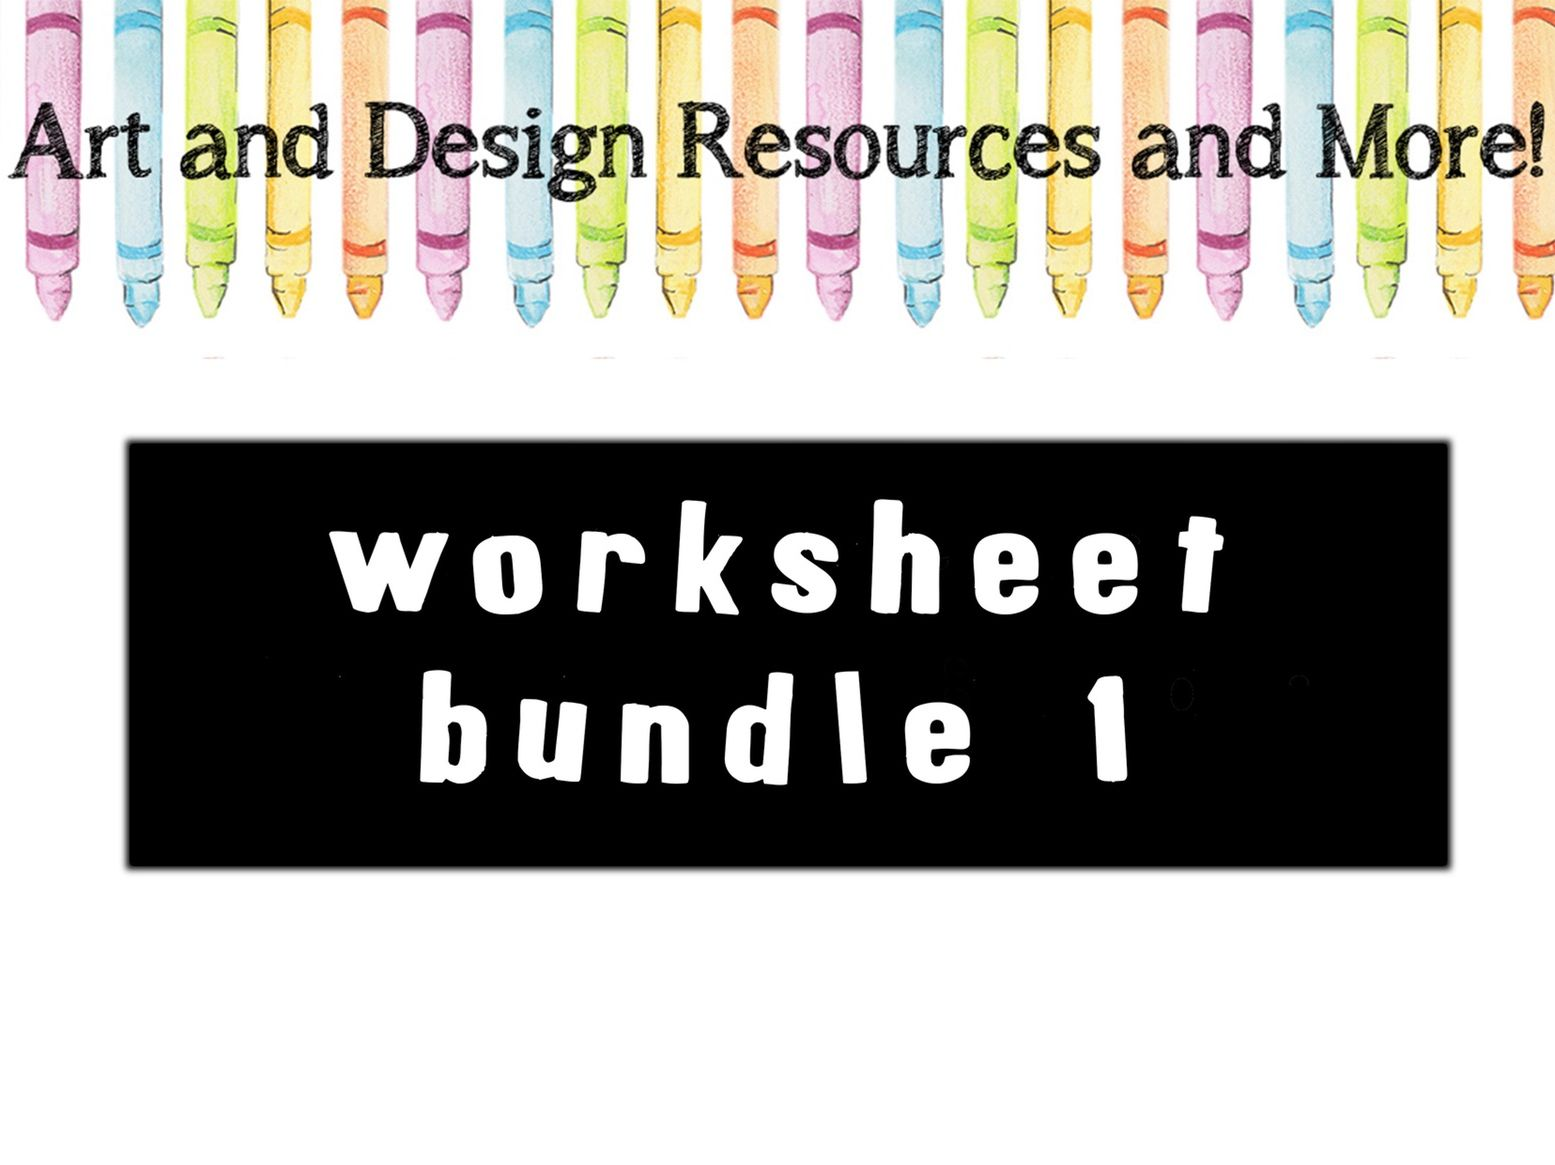 Worksheet bundle 1